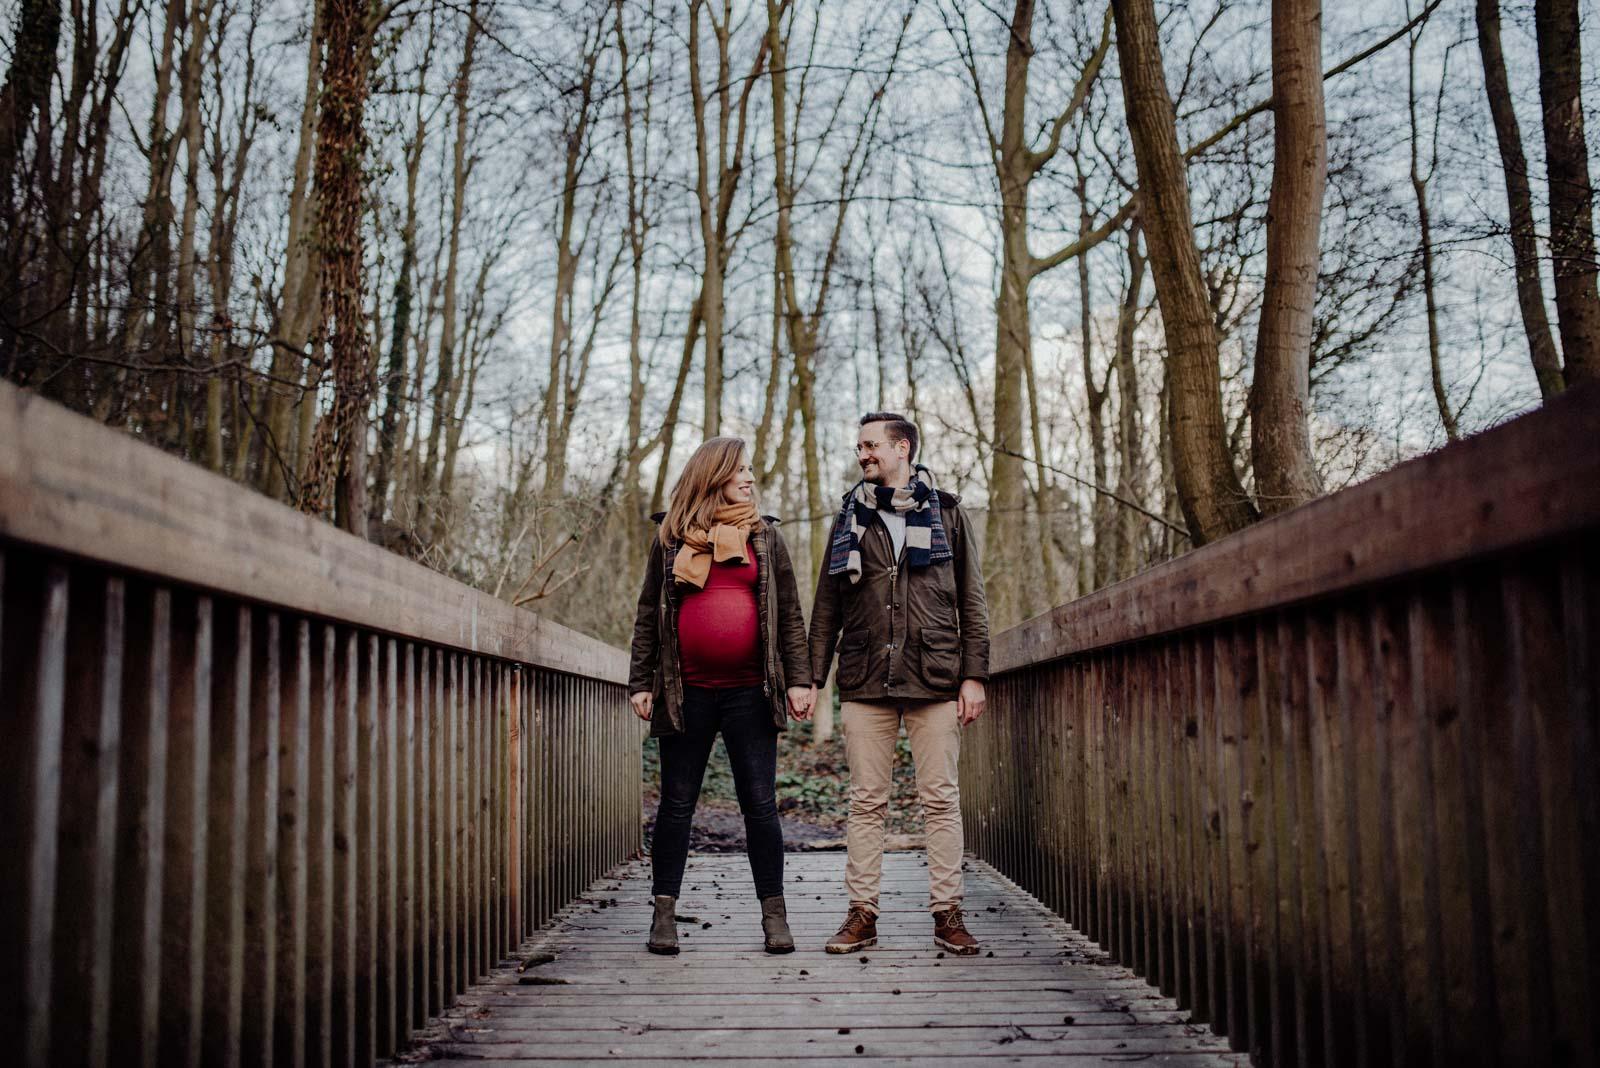 033-Babybauch-Shooting-Wald-Natur-Witten-Familienfotografie-Familienfotos